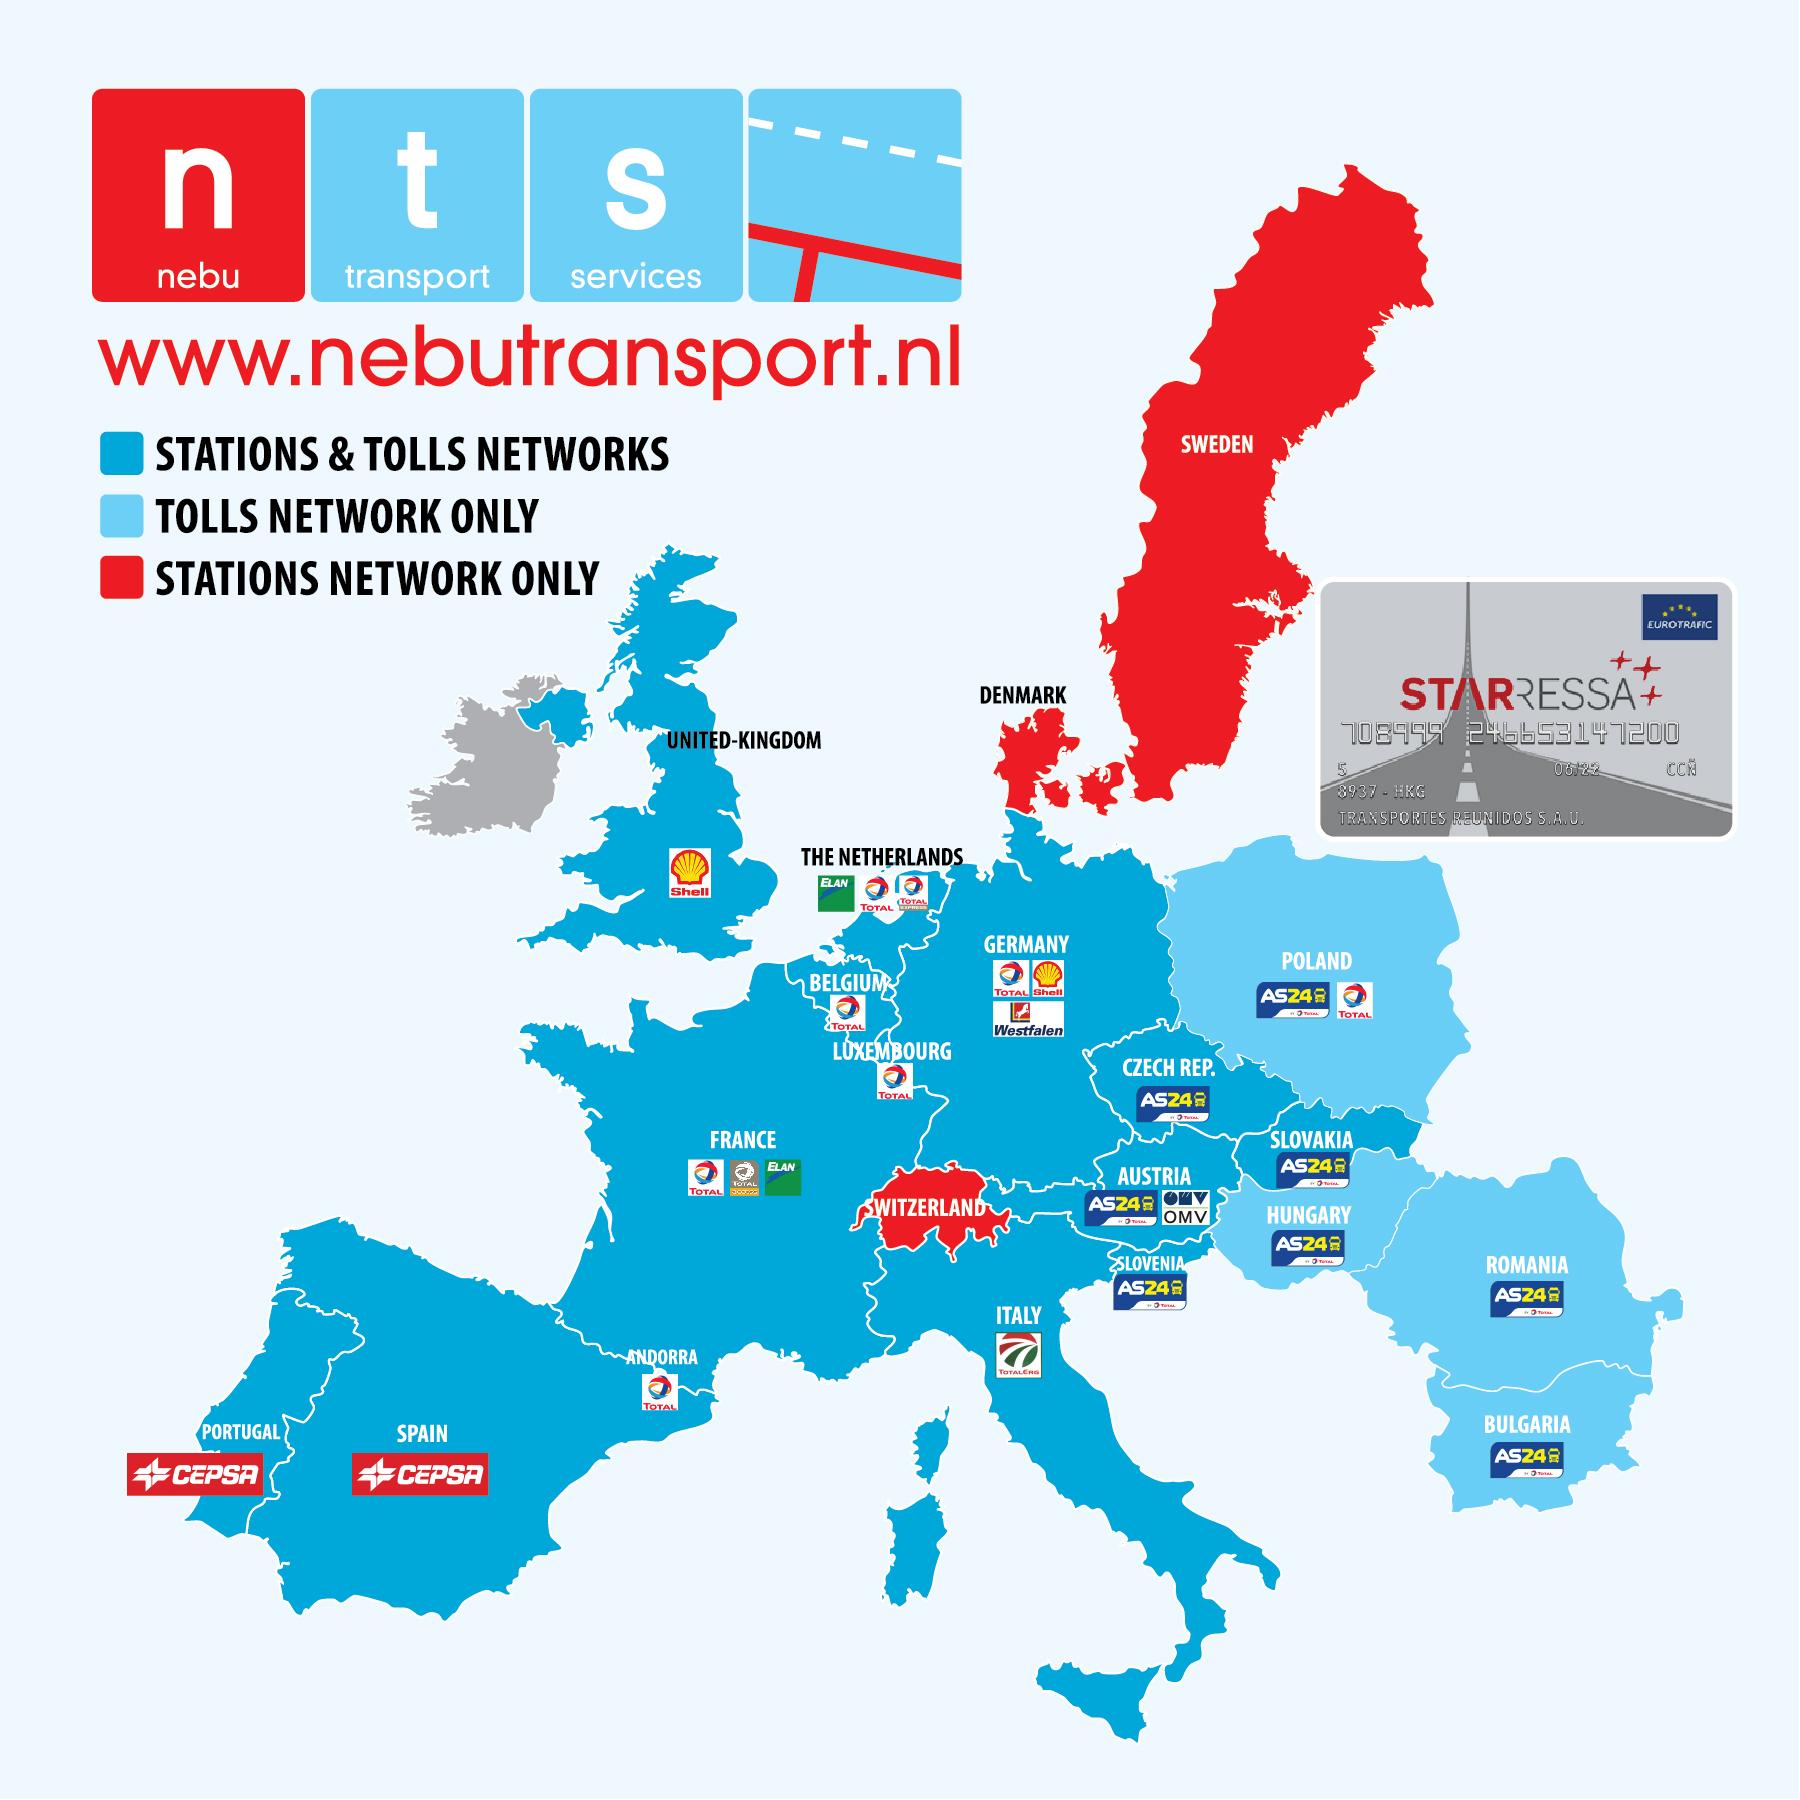 nebu-eurotrafic-card-graphic-aug2019.jpg